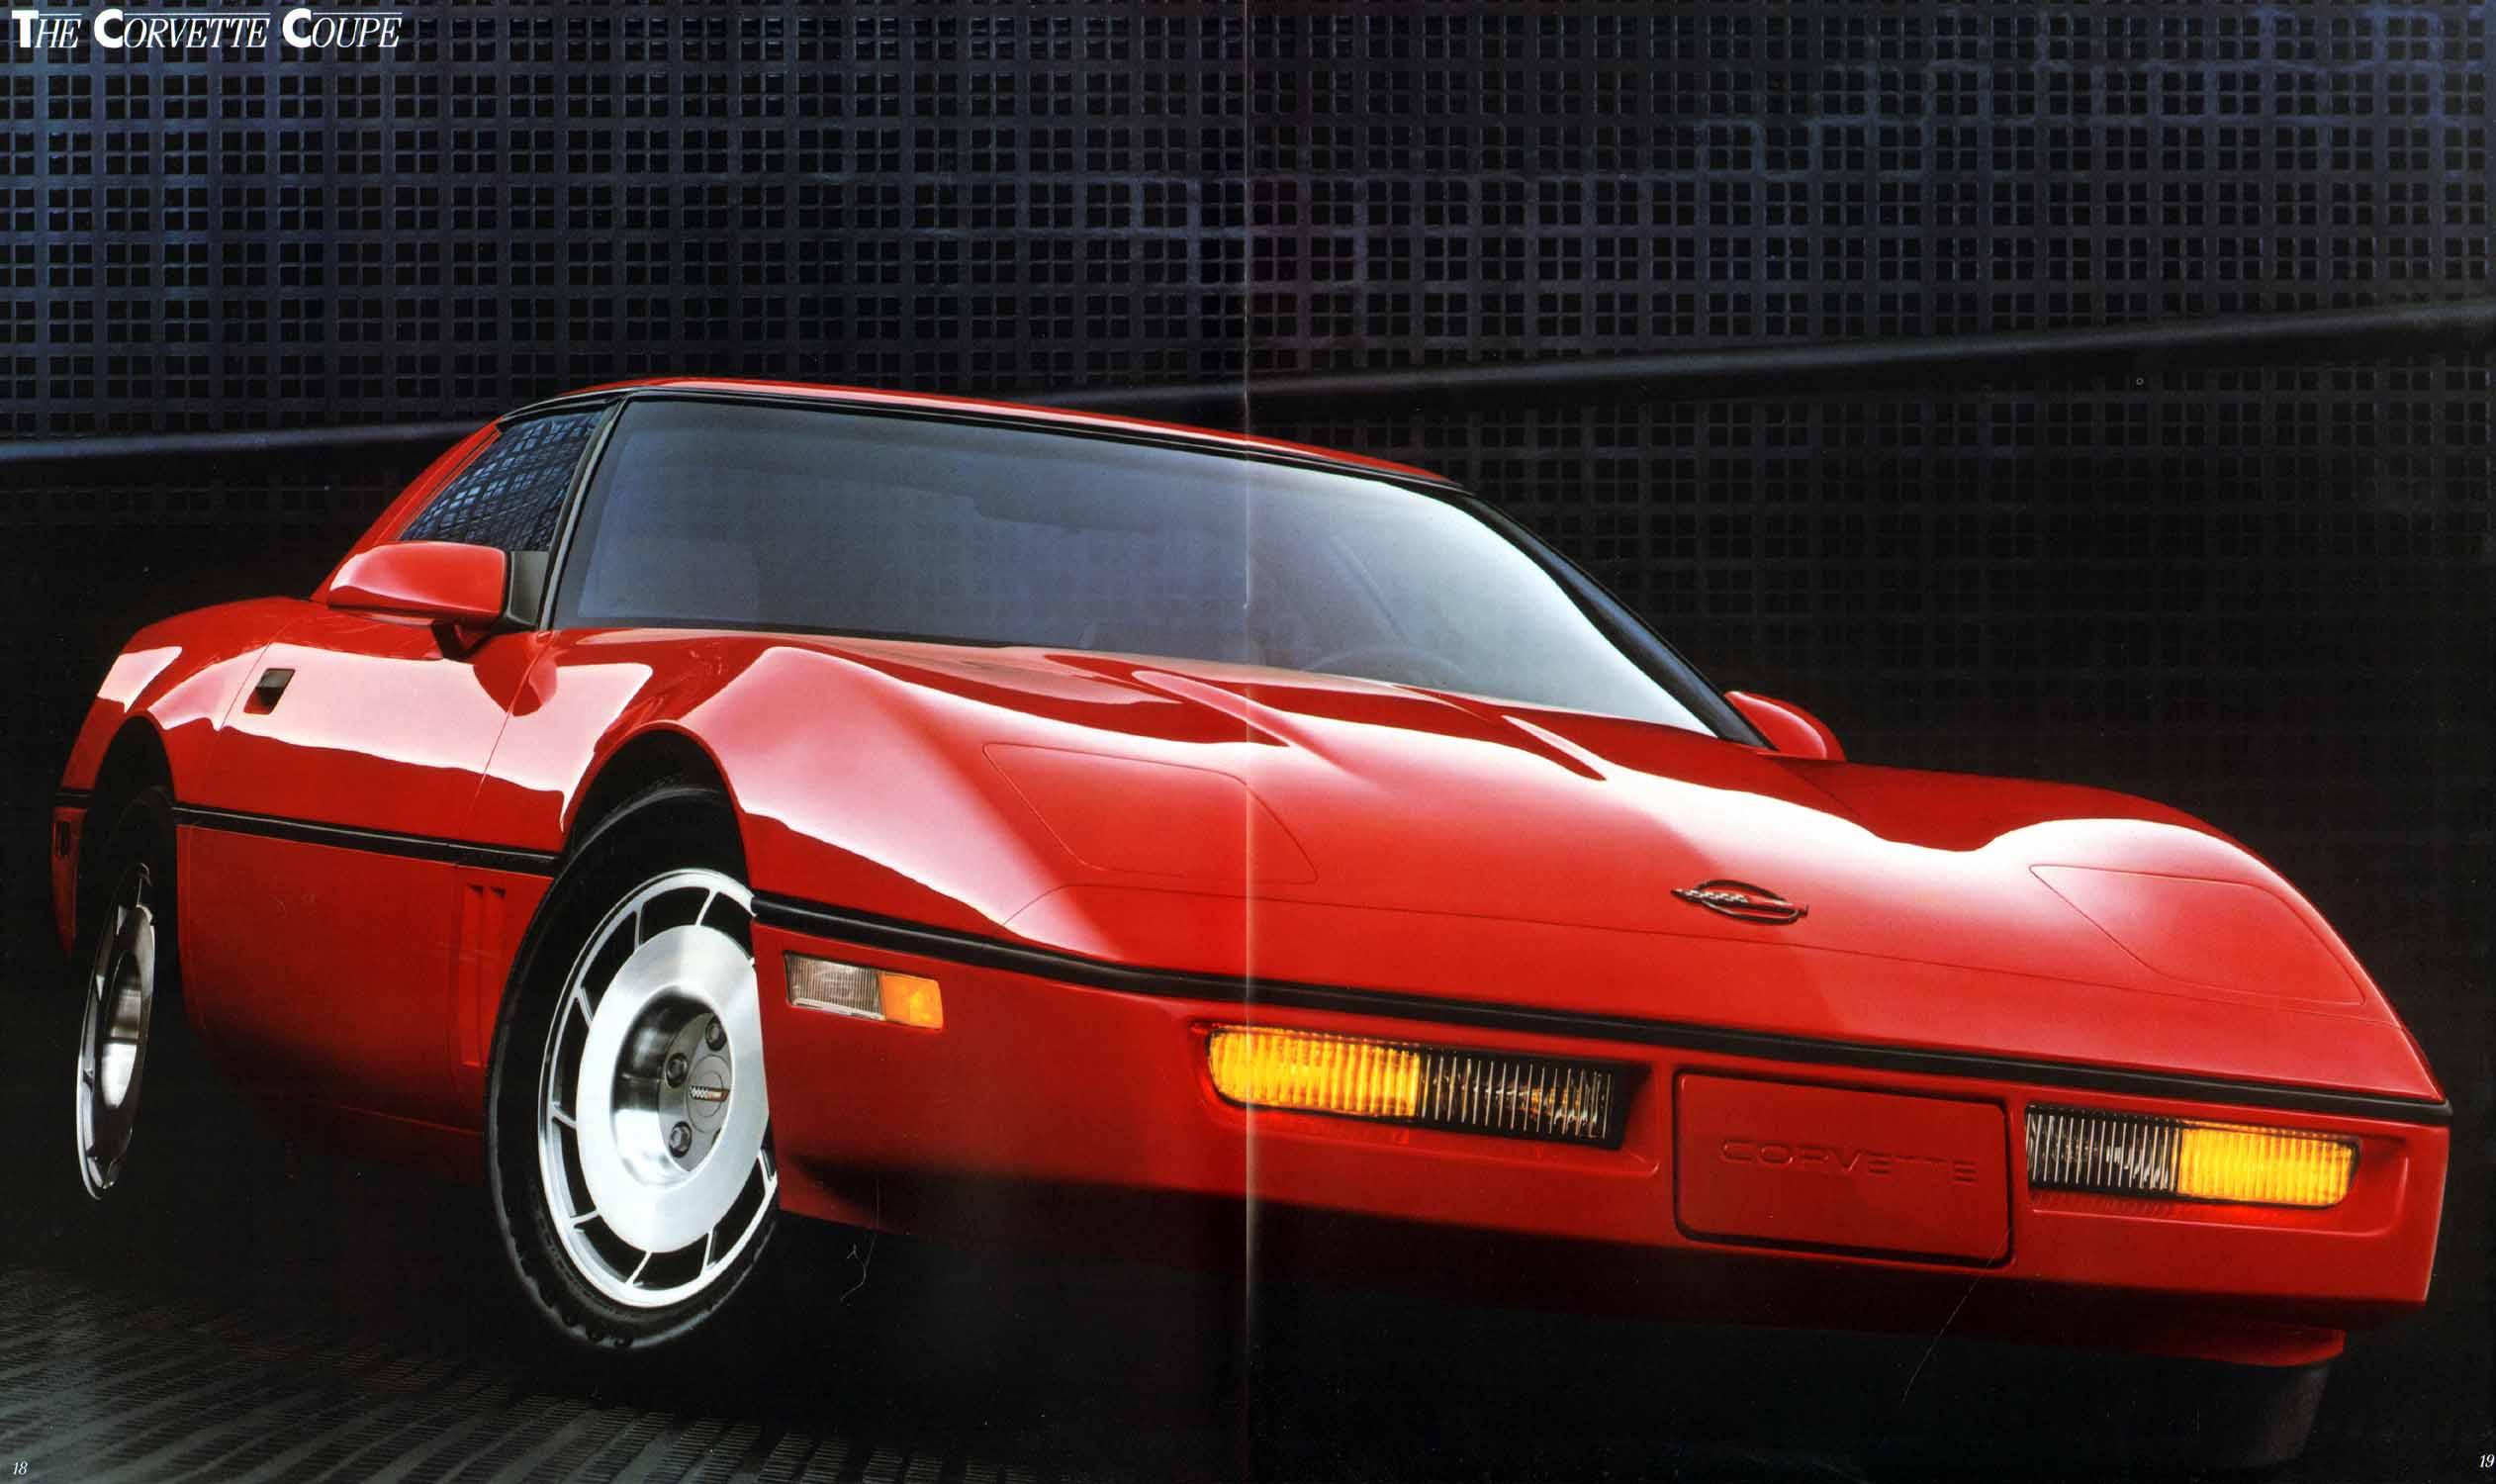 directory index chevrolet corvette 1987 chevrolet corvette 1987 chevrolet corvette prestige. Black Bedroom Furniture Sets. Home Design Ideas